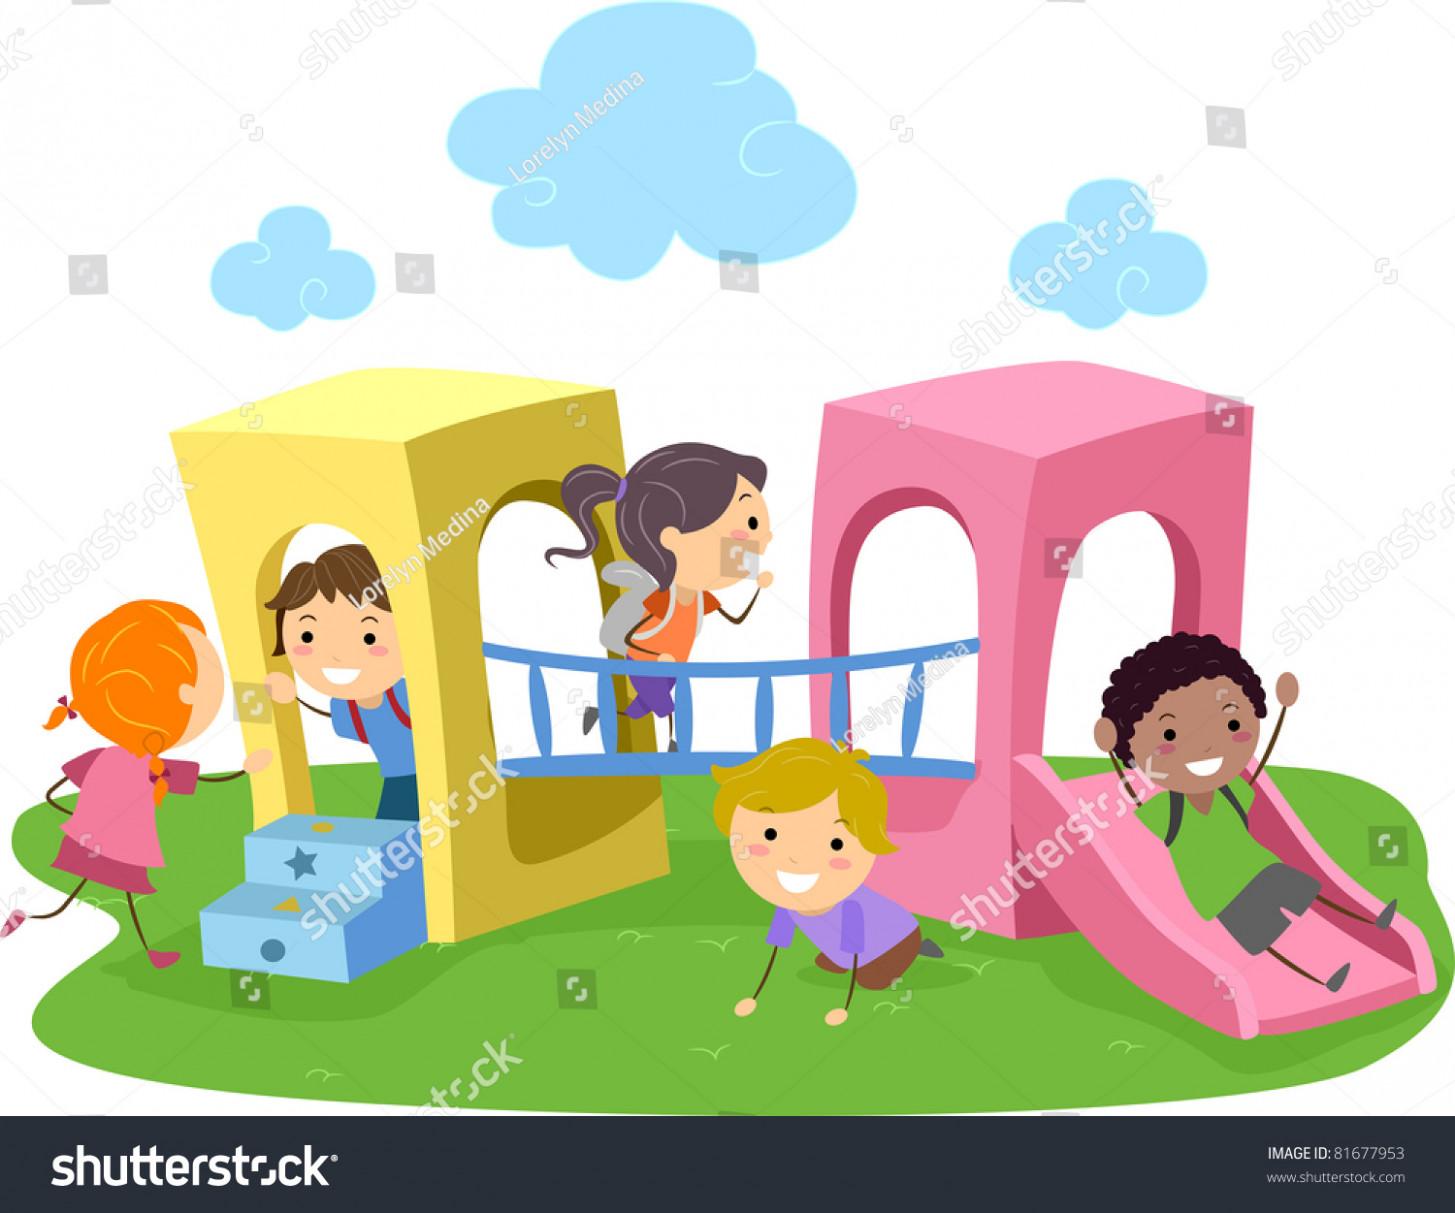 1455x1213 Illustration Kids Playing Playground Stock Vector 18 Cotton